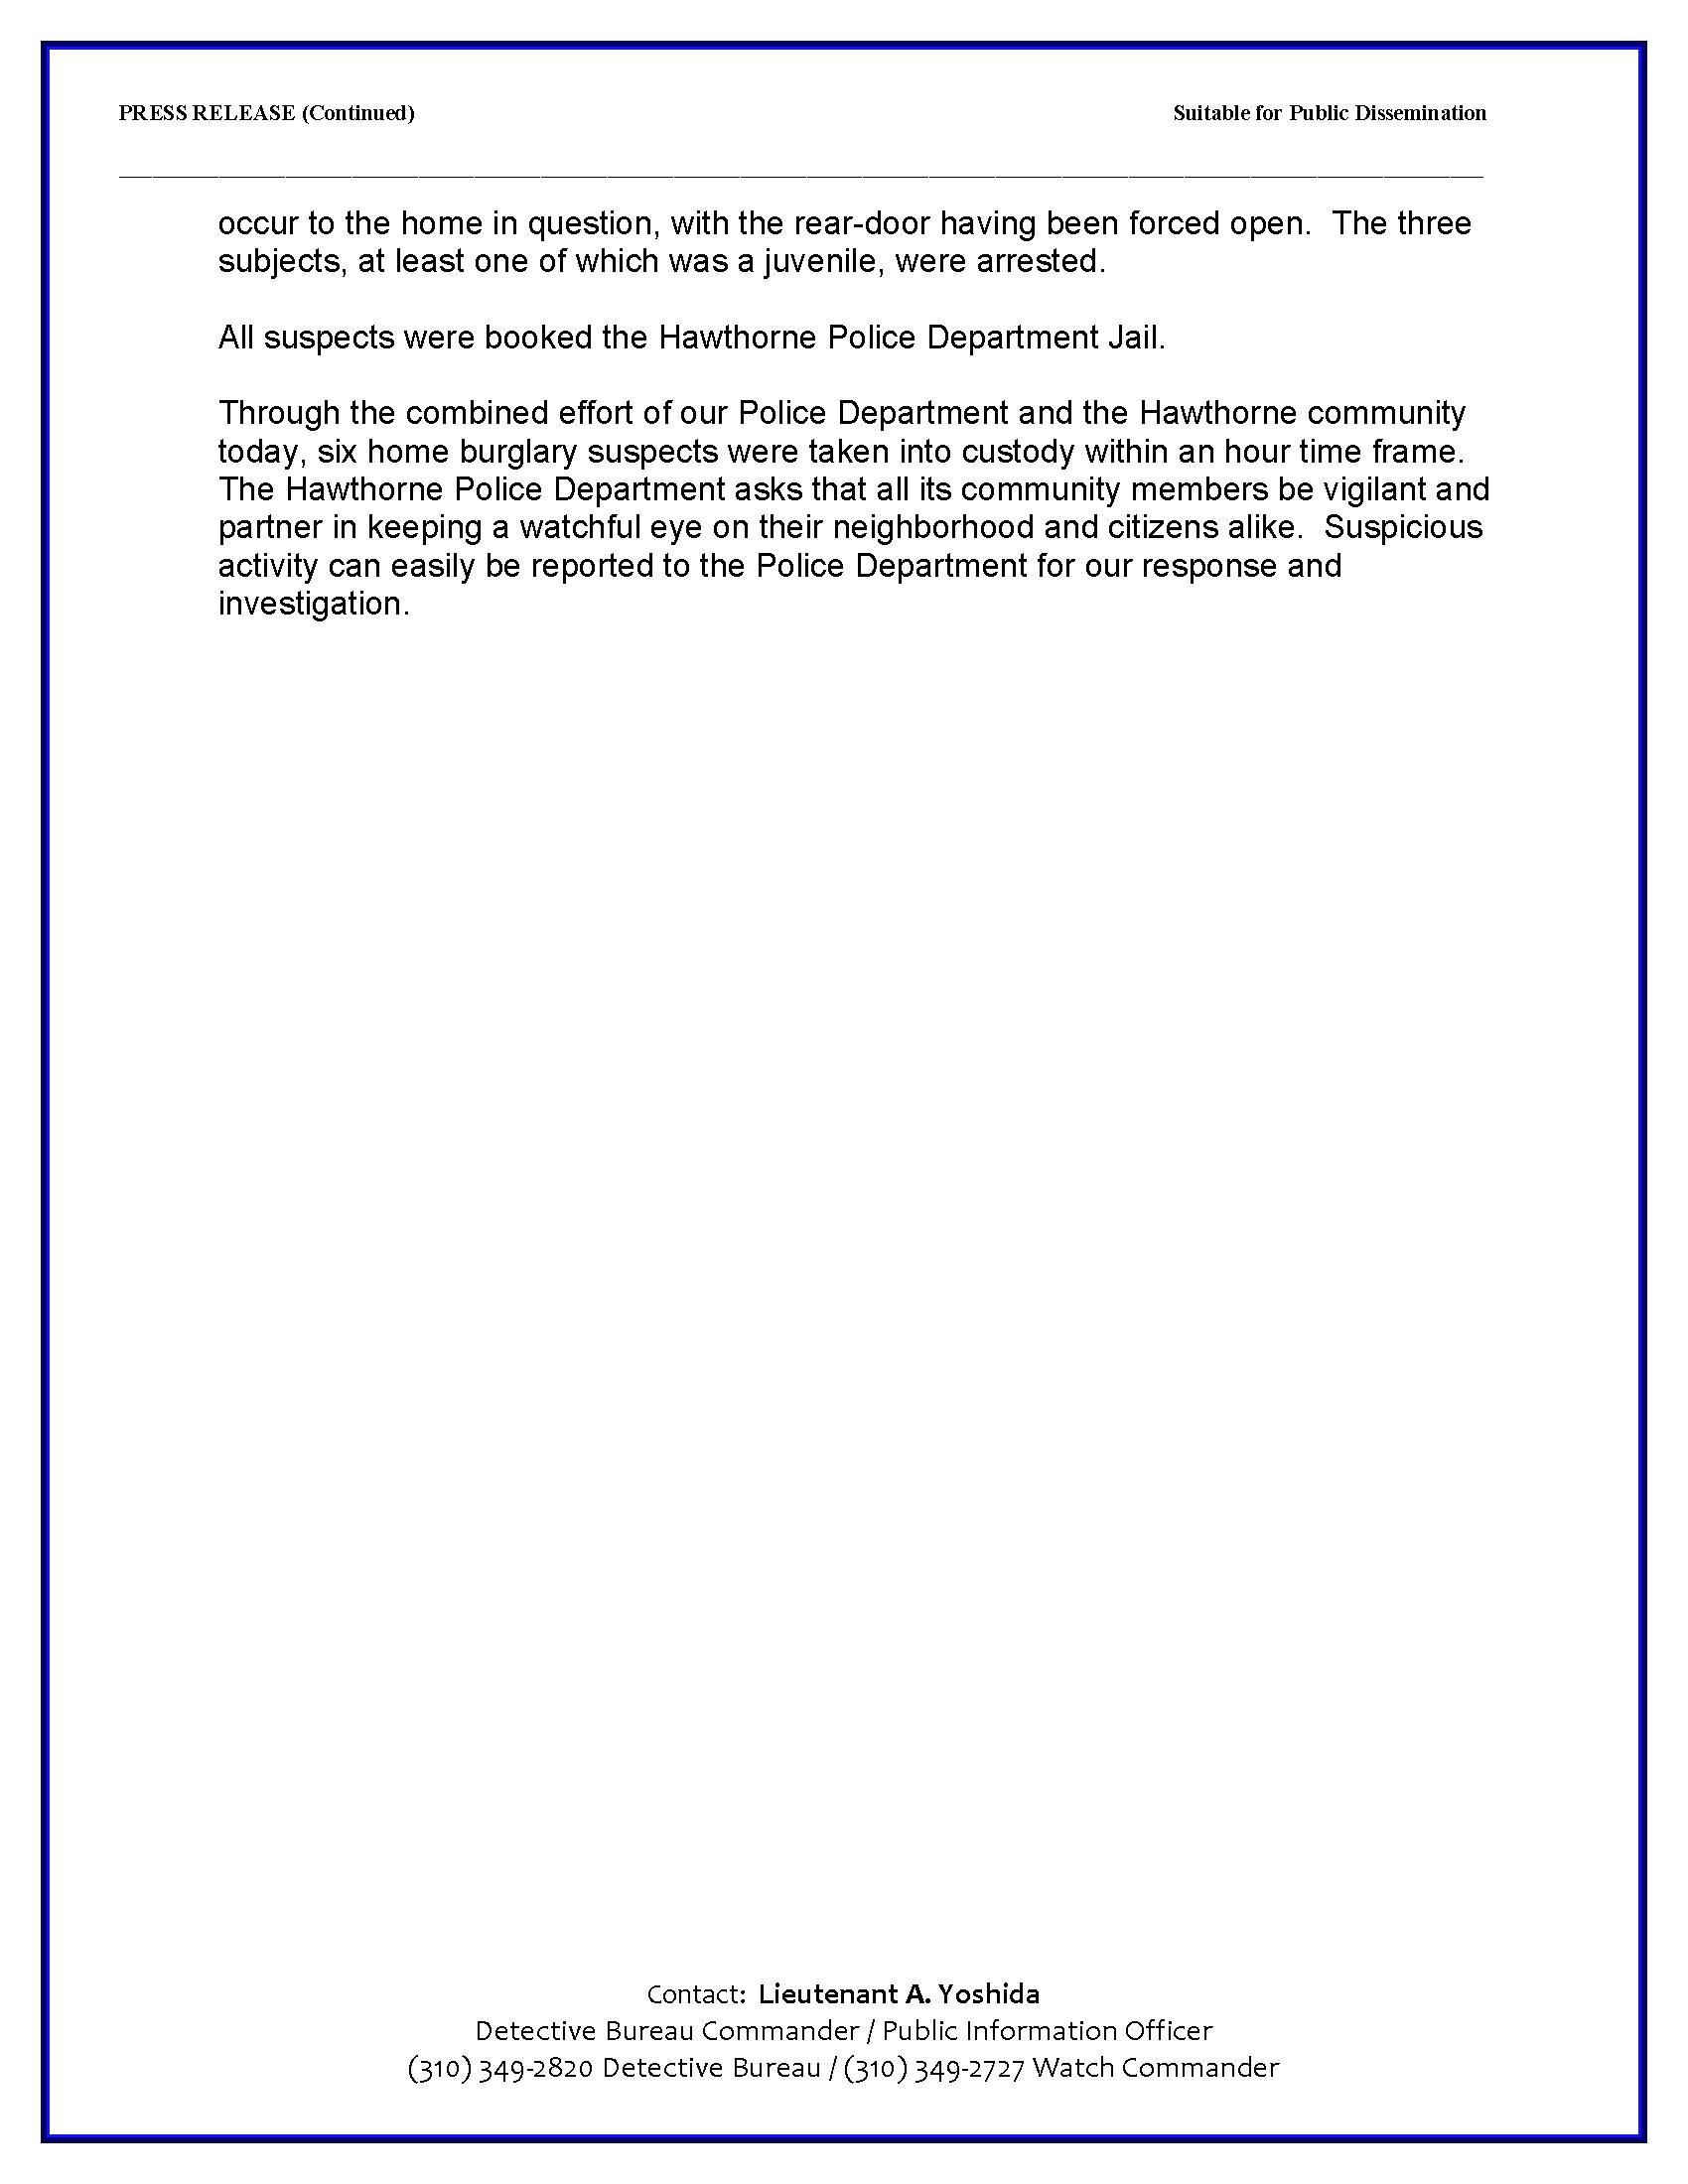 PDF HERE